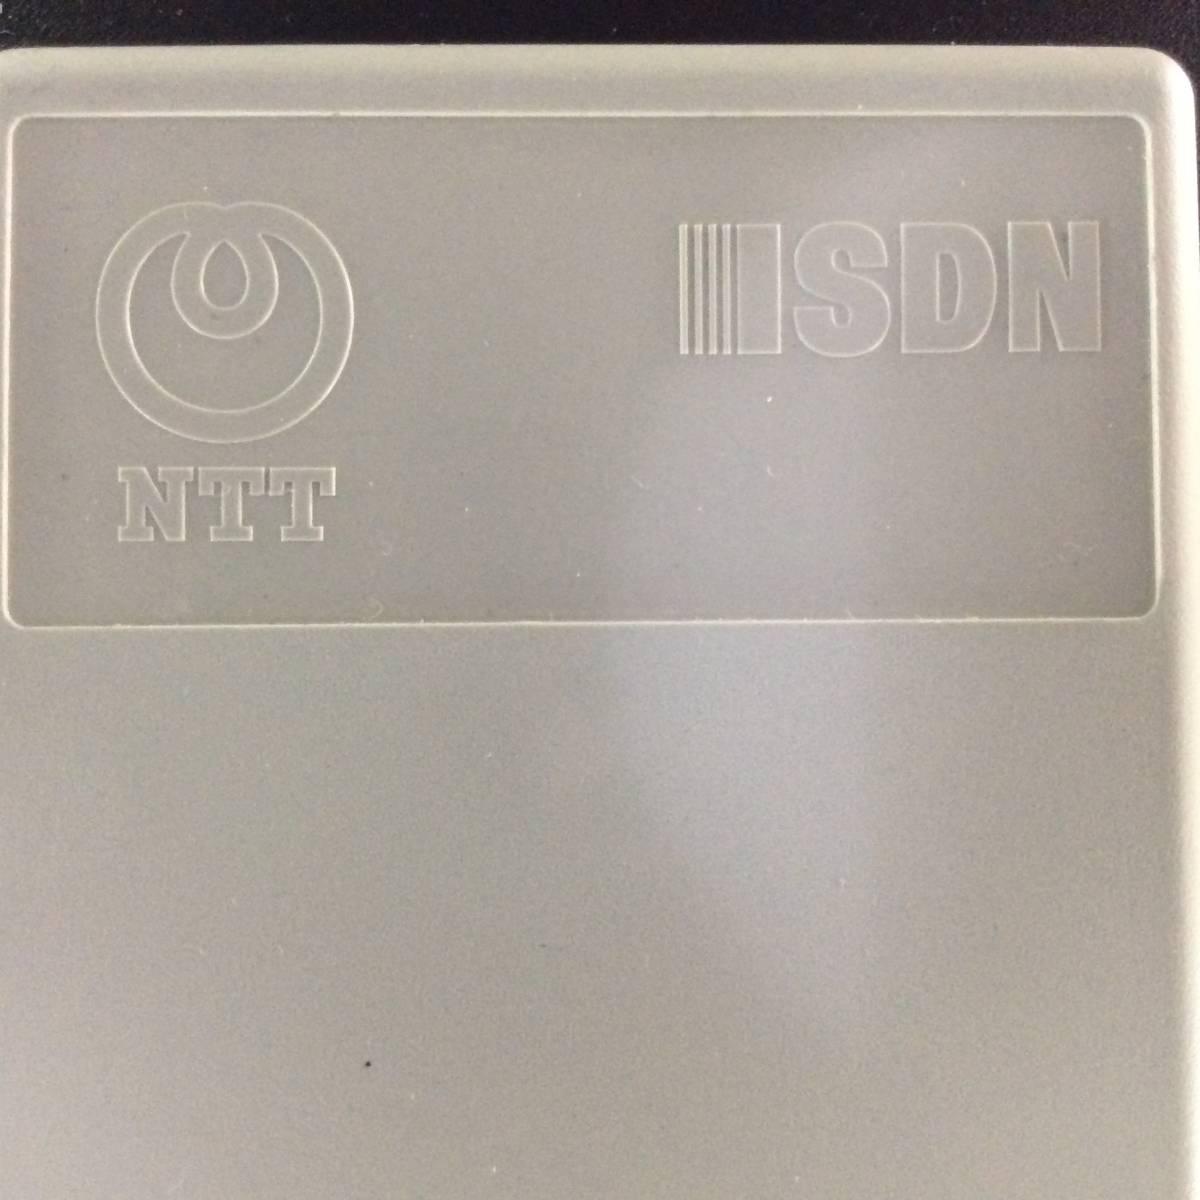 ★☆★ NTT 西日本 SL-144K F DSU-E〈R〉★☆★ 一度使用 美品 ★☆★ISDN DSU I-DSU64VB デジタル回線接続装置 _画像8